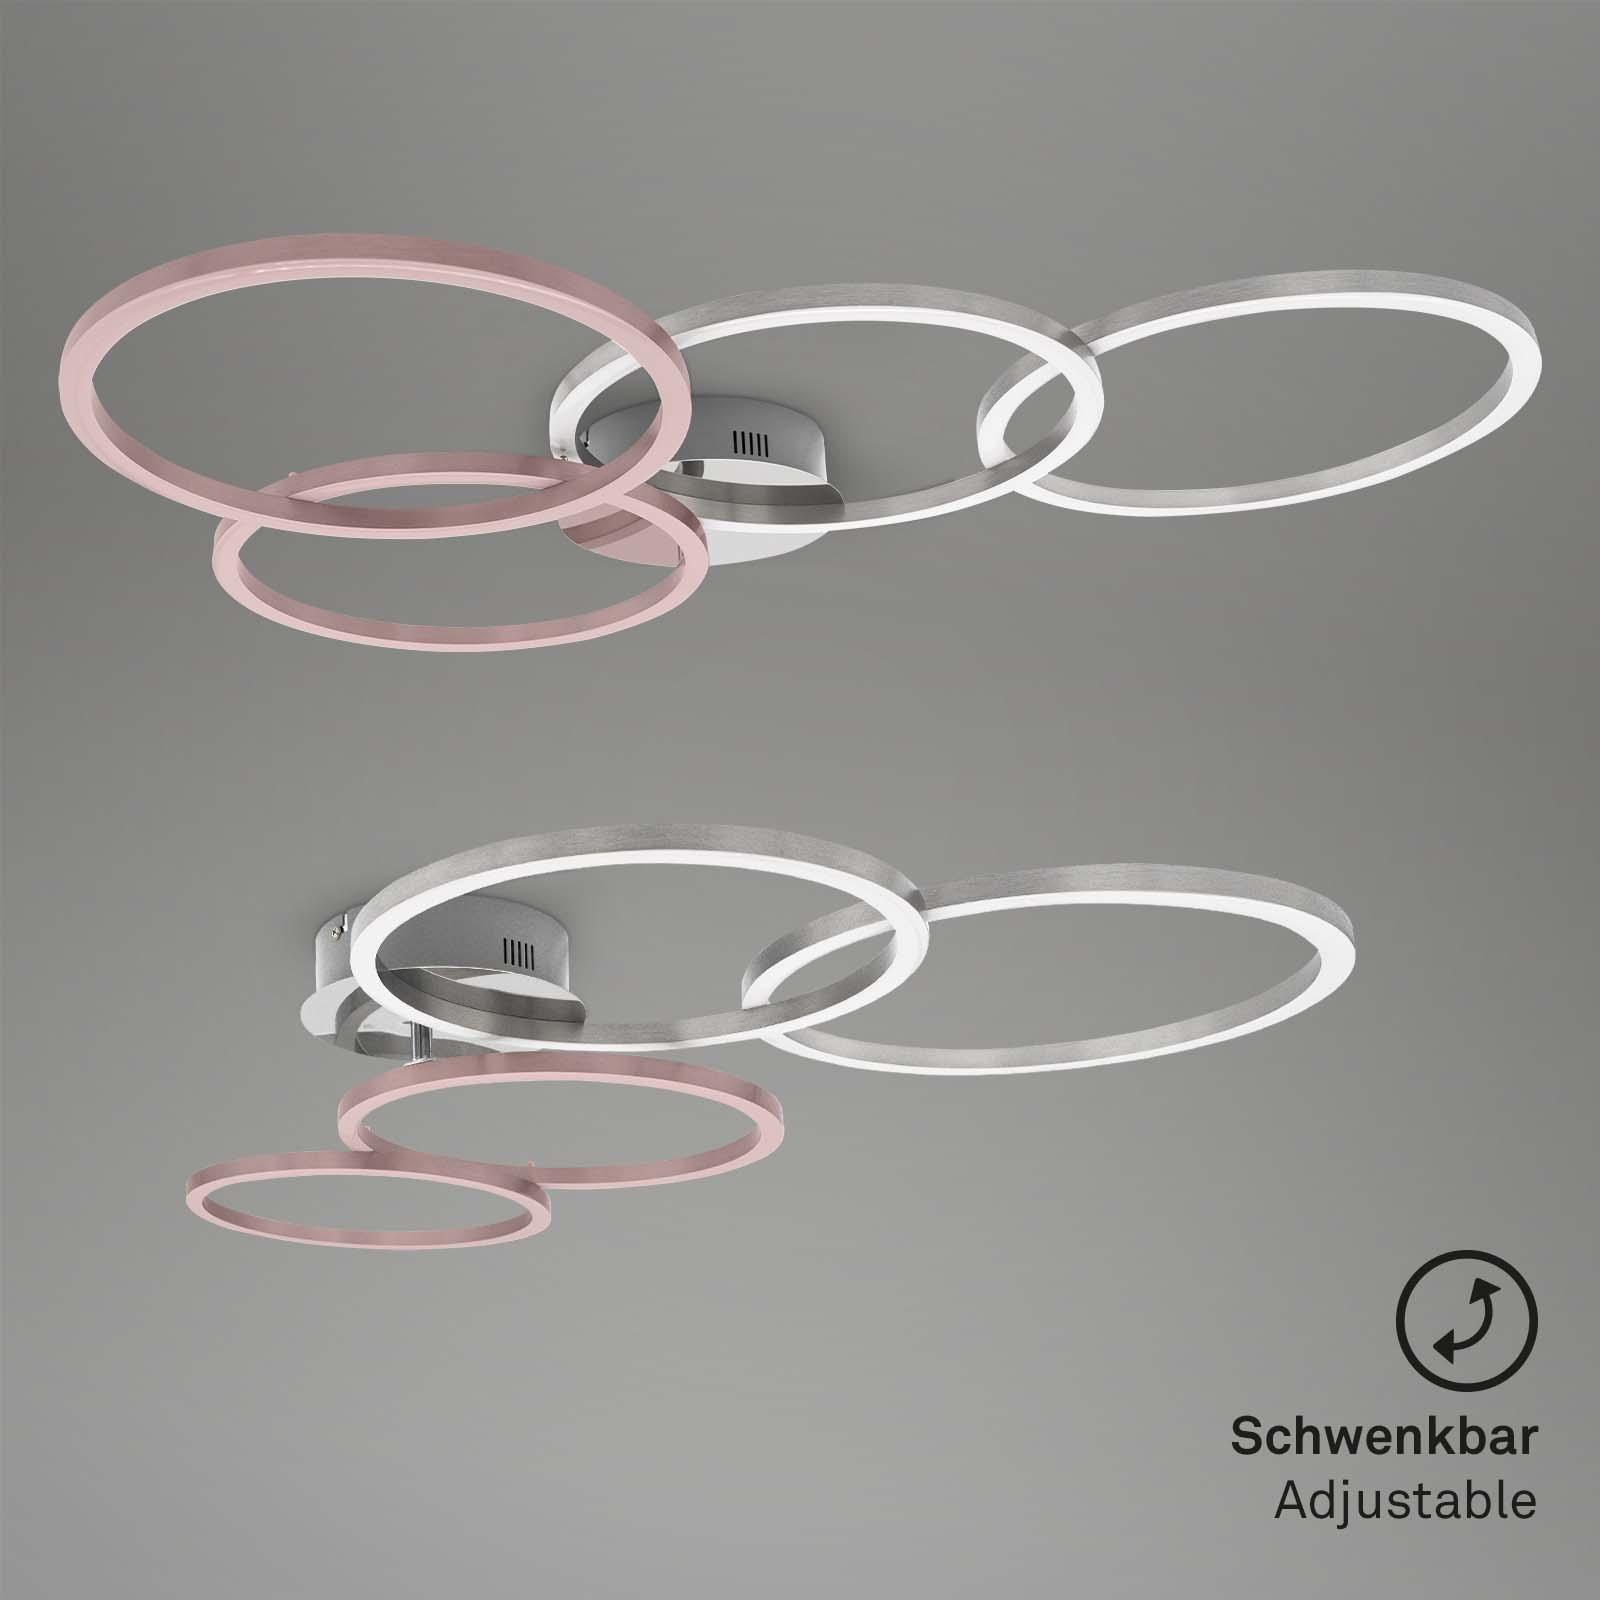 Frame CCT LED Deckenleuchte alufarbig-chrom Schwenkbar